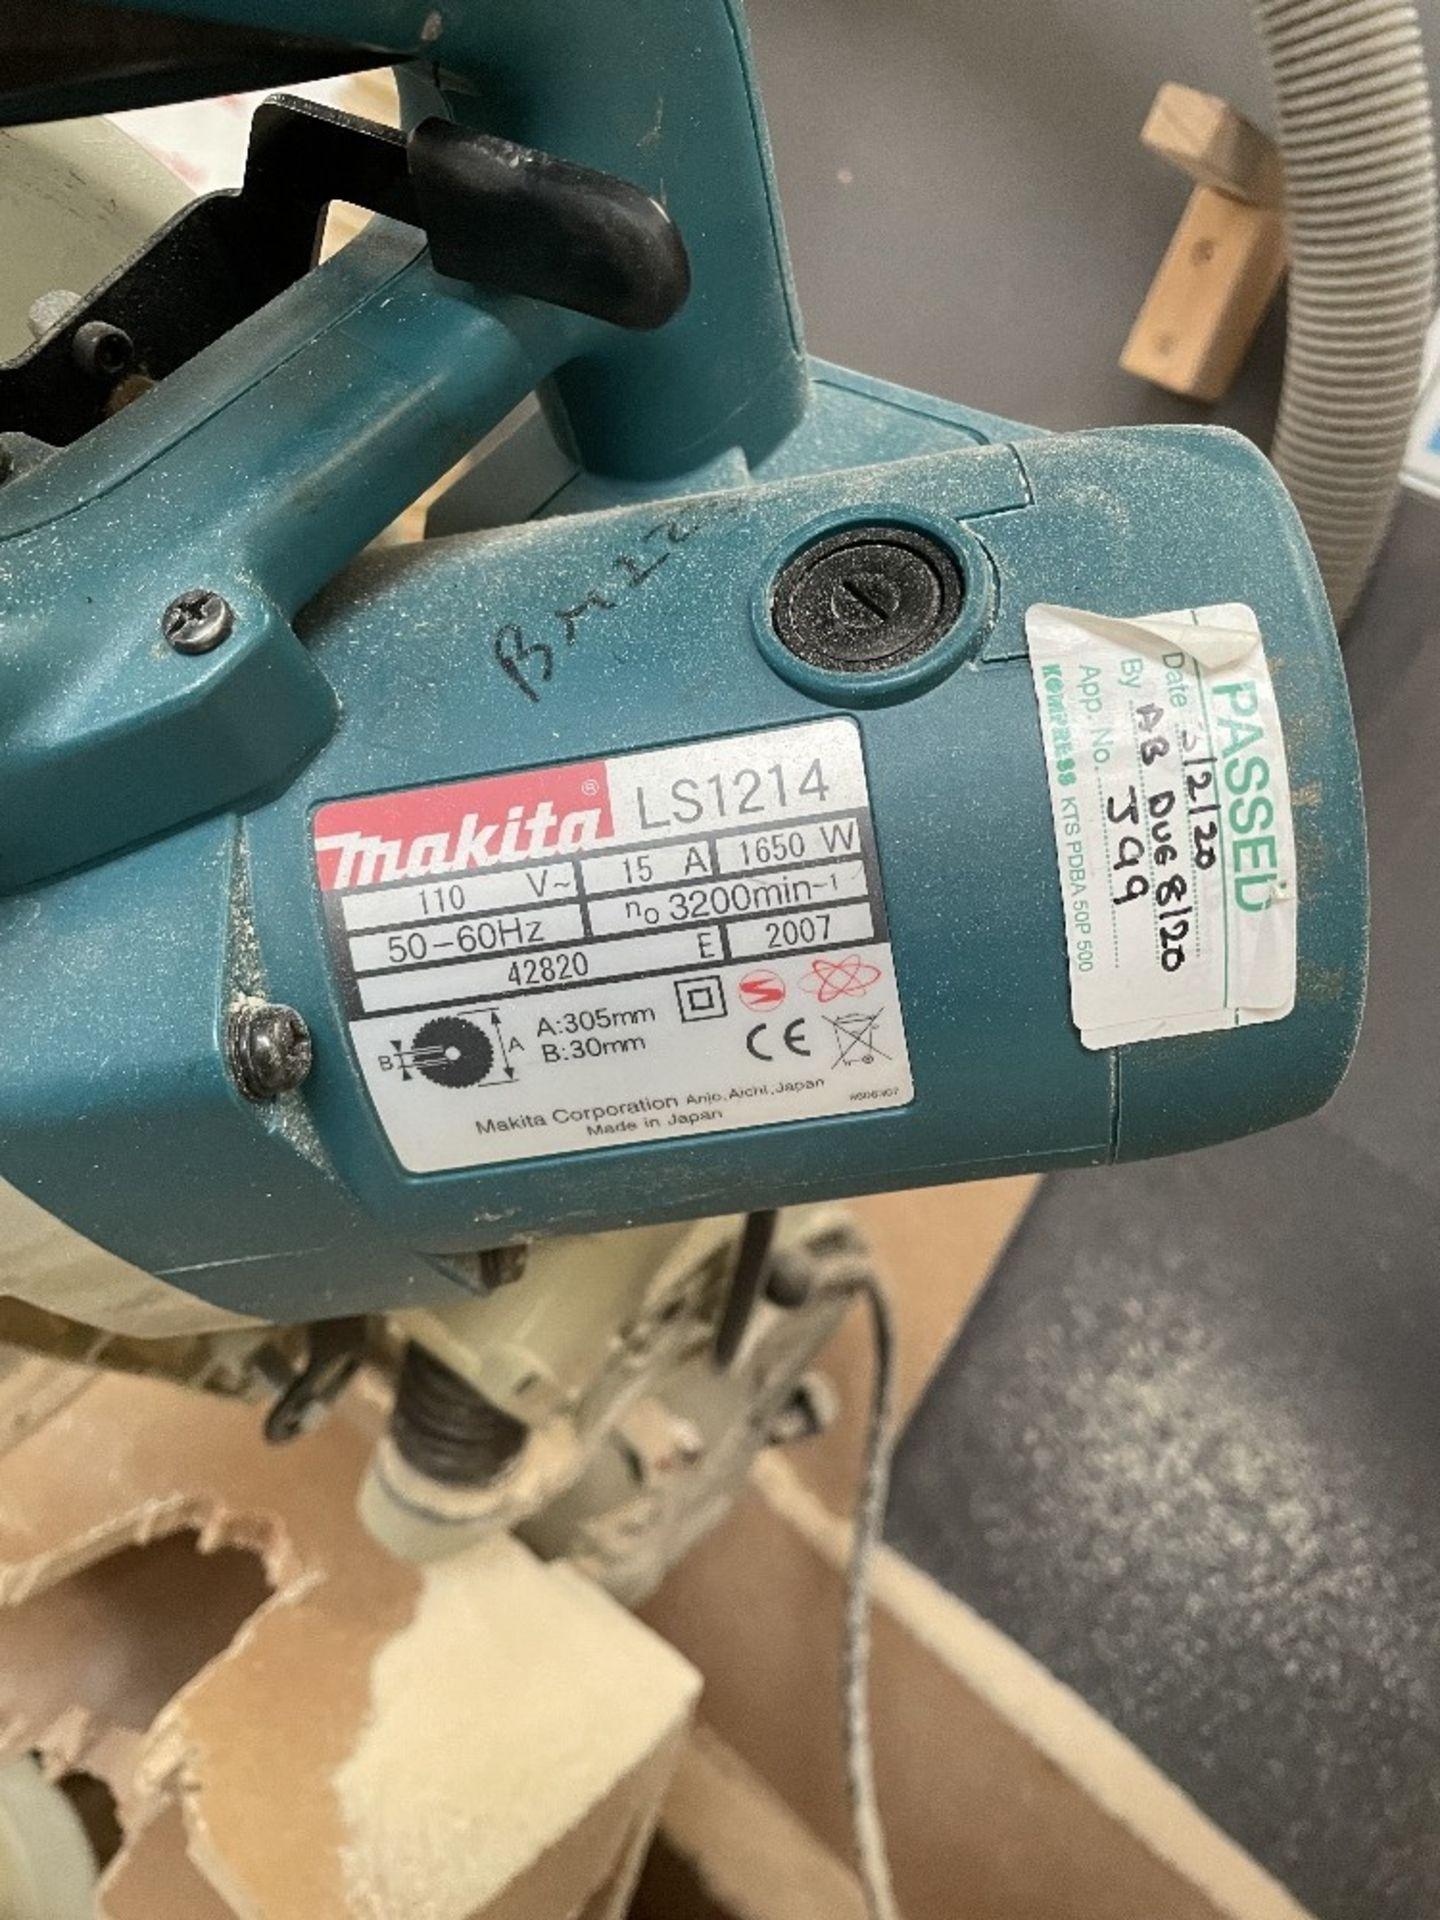 Makita LS1214 Corded 305mm Slide Compound Mitre Saw   110v - Image 2 of 6